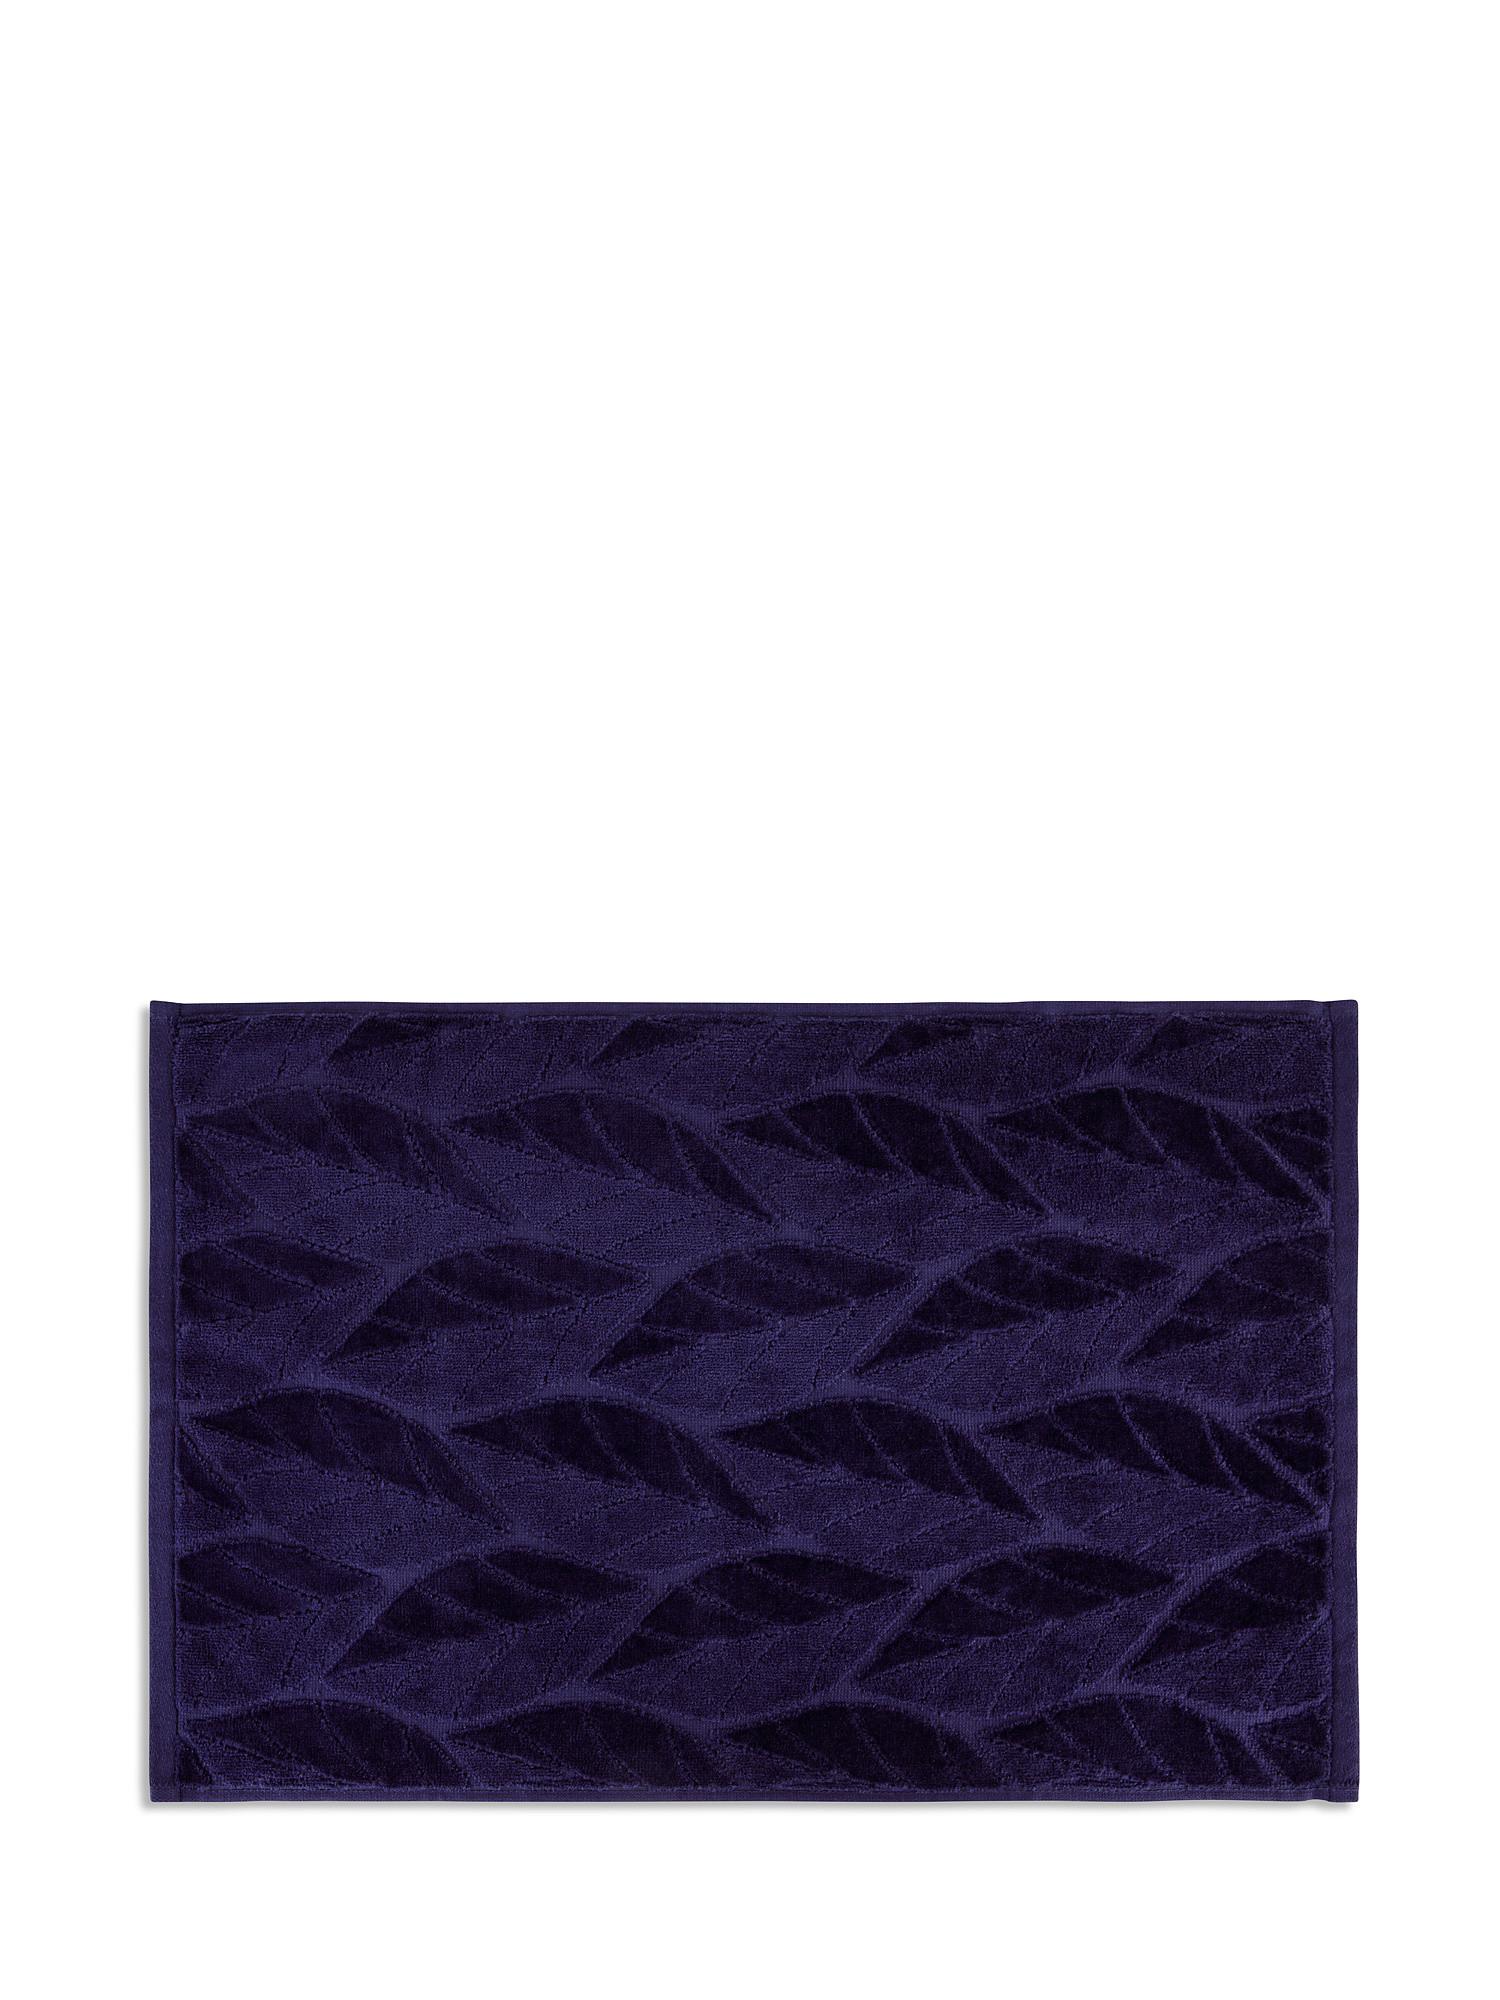 Asciugamano cotone velour tinta unita, Blu, large image number 1